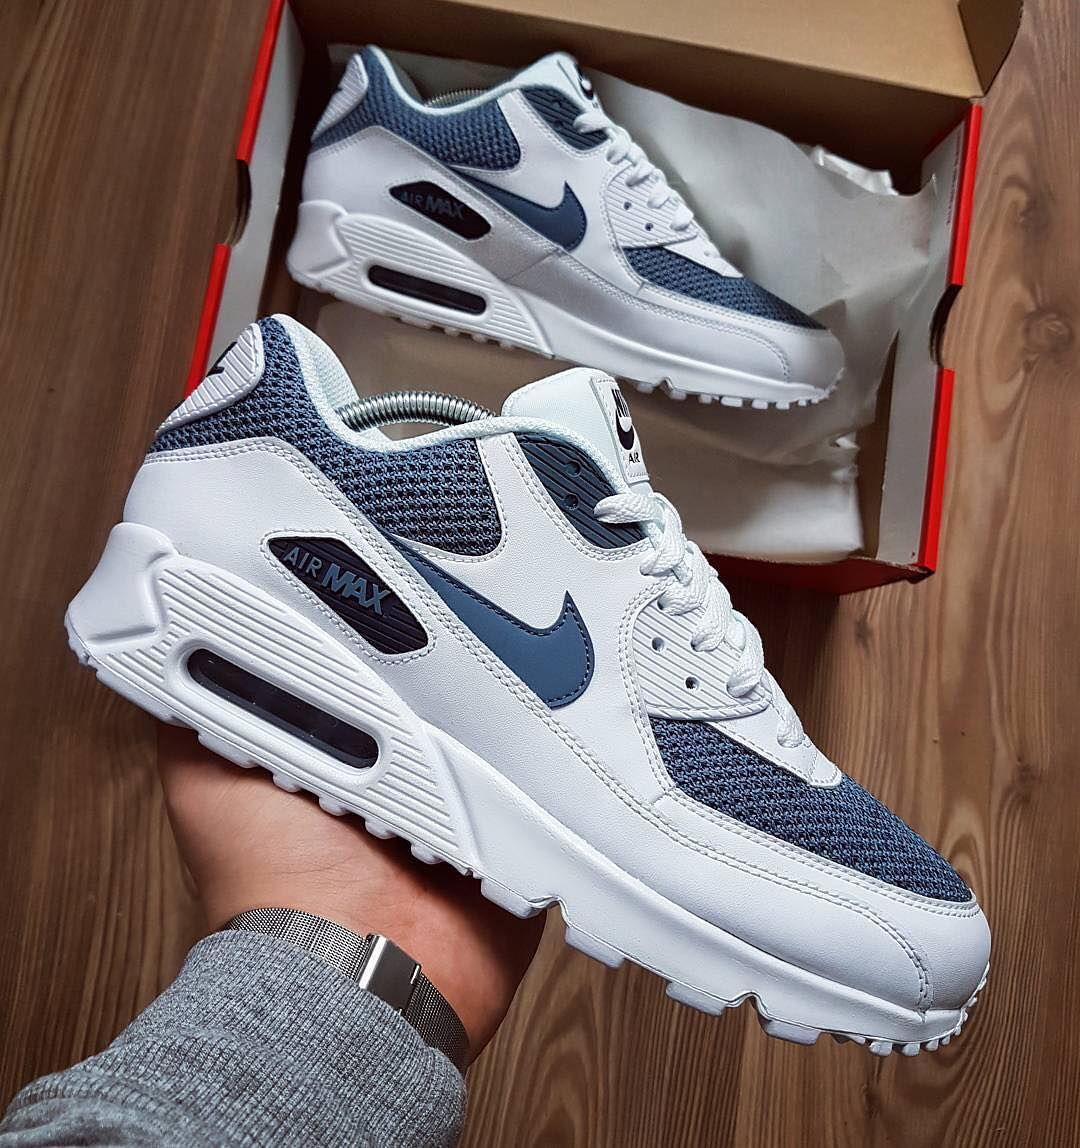 Gris Zapatos De Estilo Nike Air Max 90 Mesh Gs Para Mujer